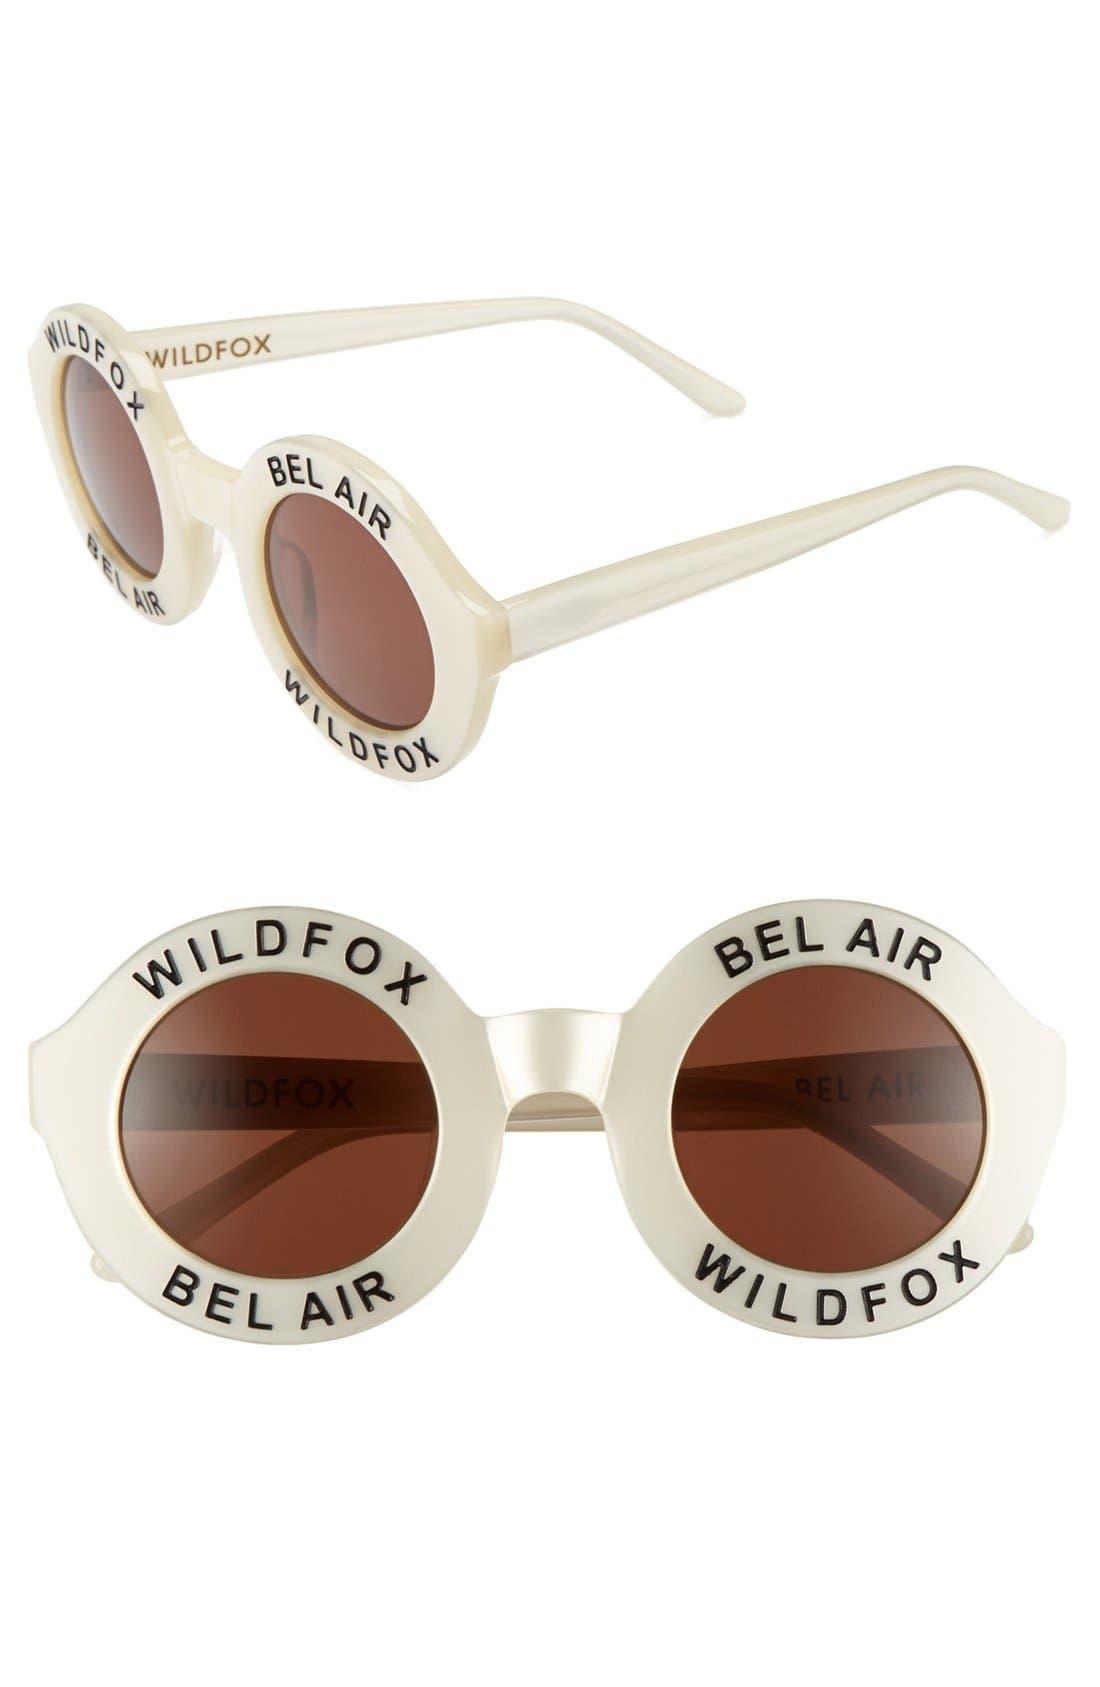 WILDFOX Bel Air 44mm Sunglasses